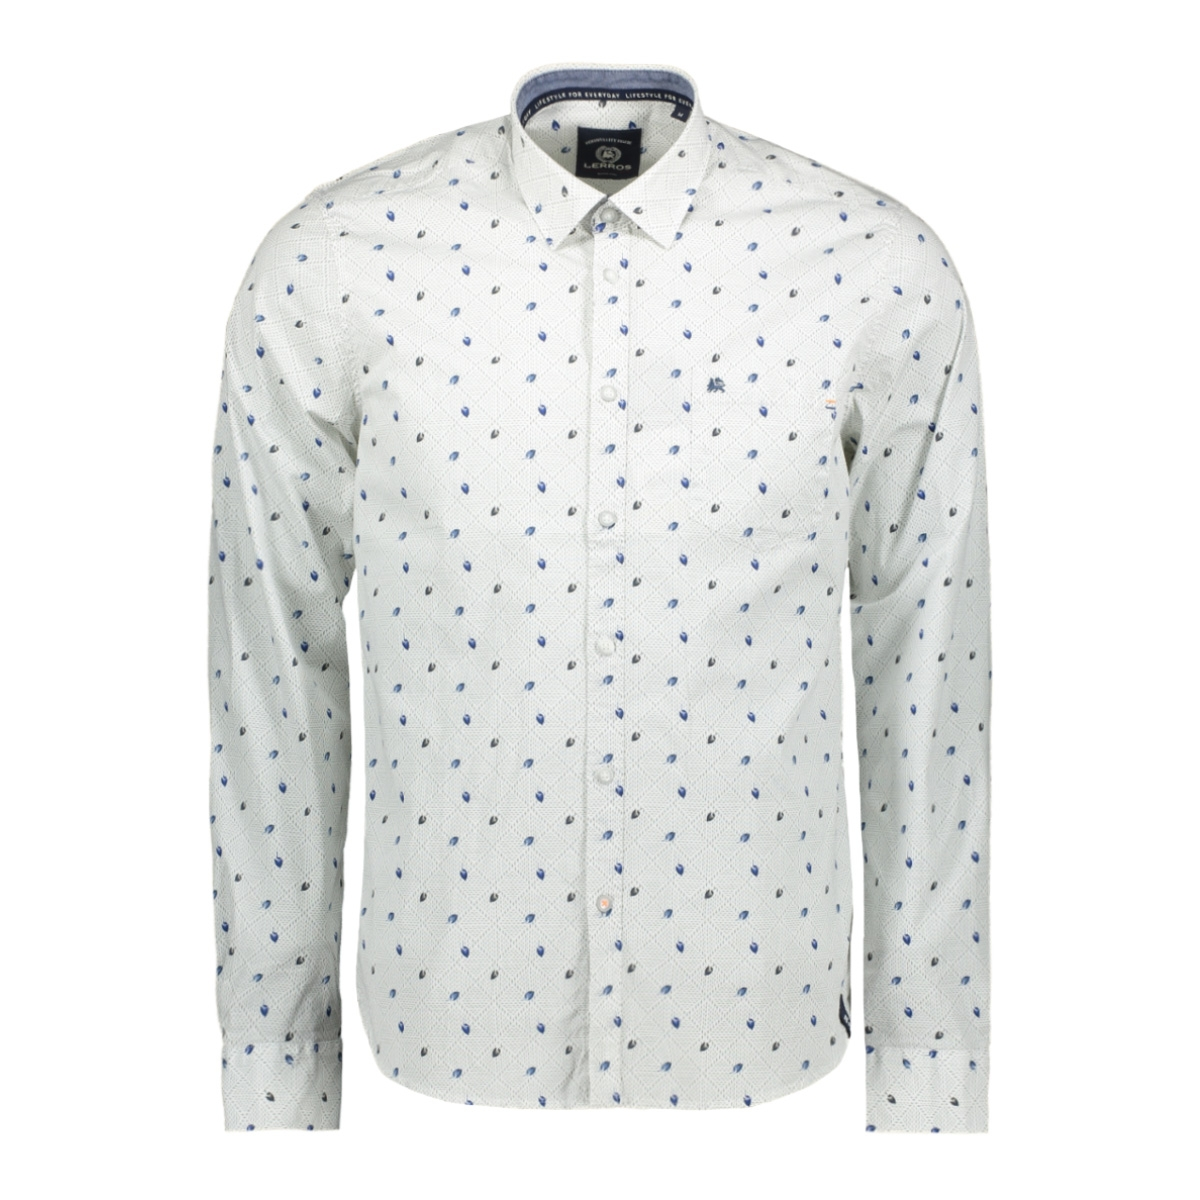 overhemd met all over print 2971017 lerros overhemd 222